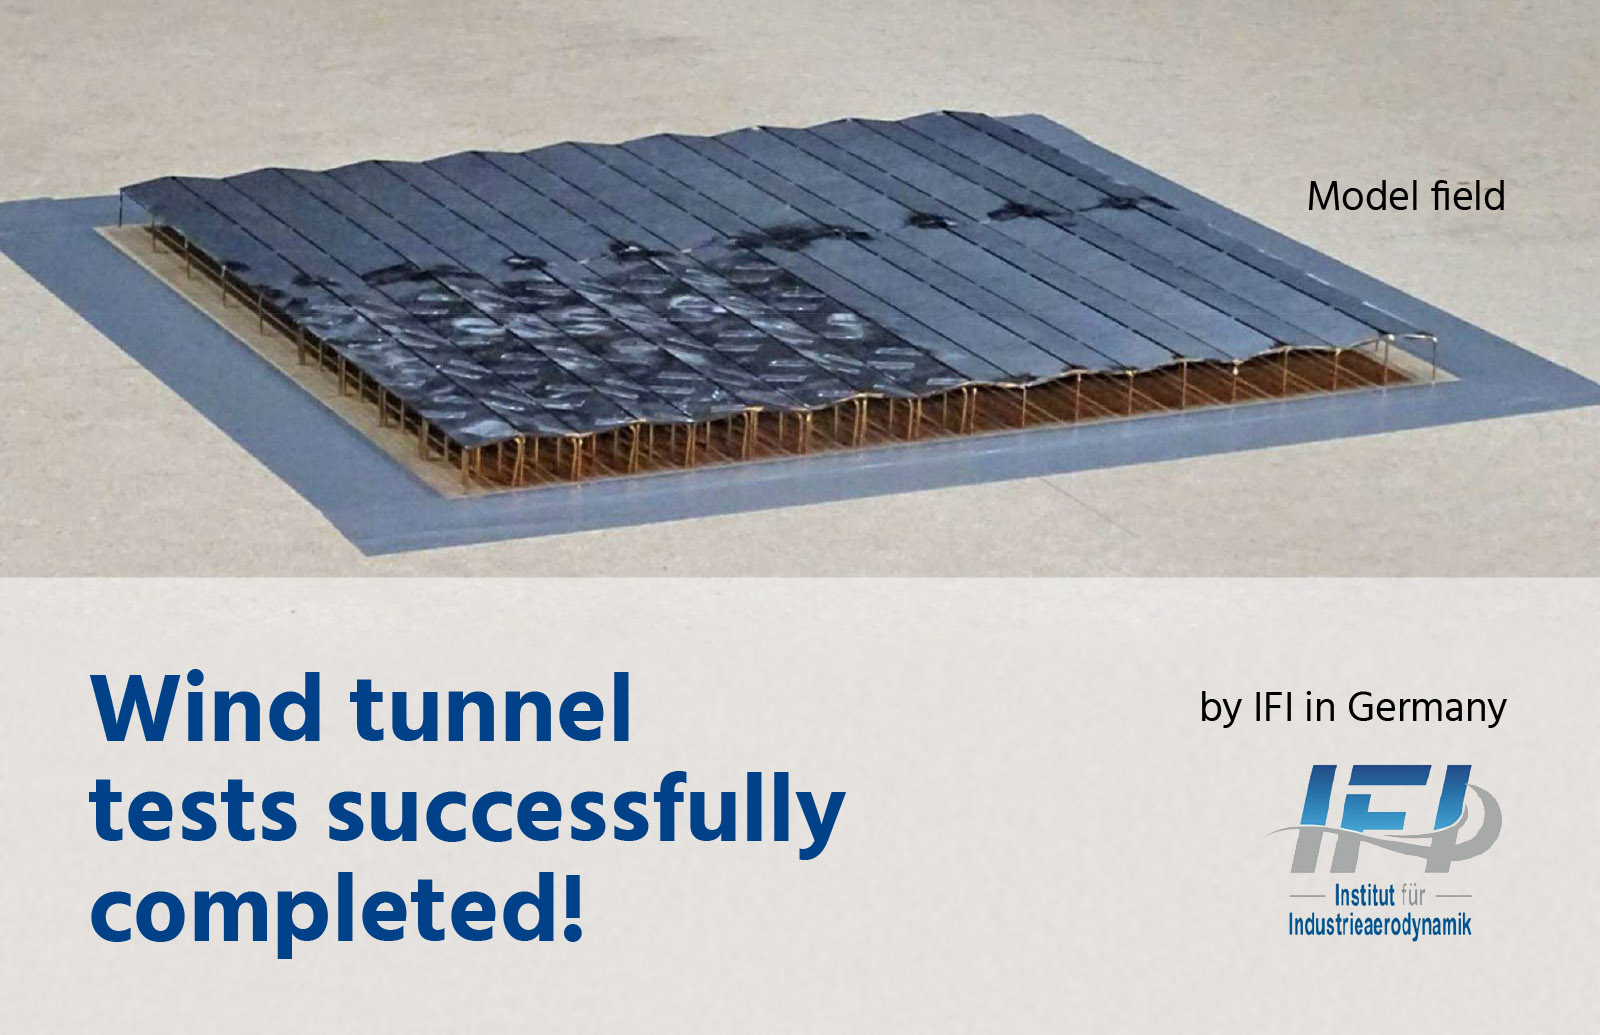 Wind tunnel solar power plant